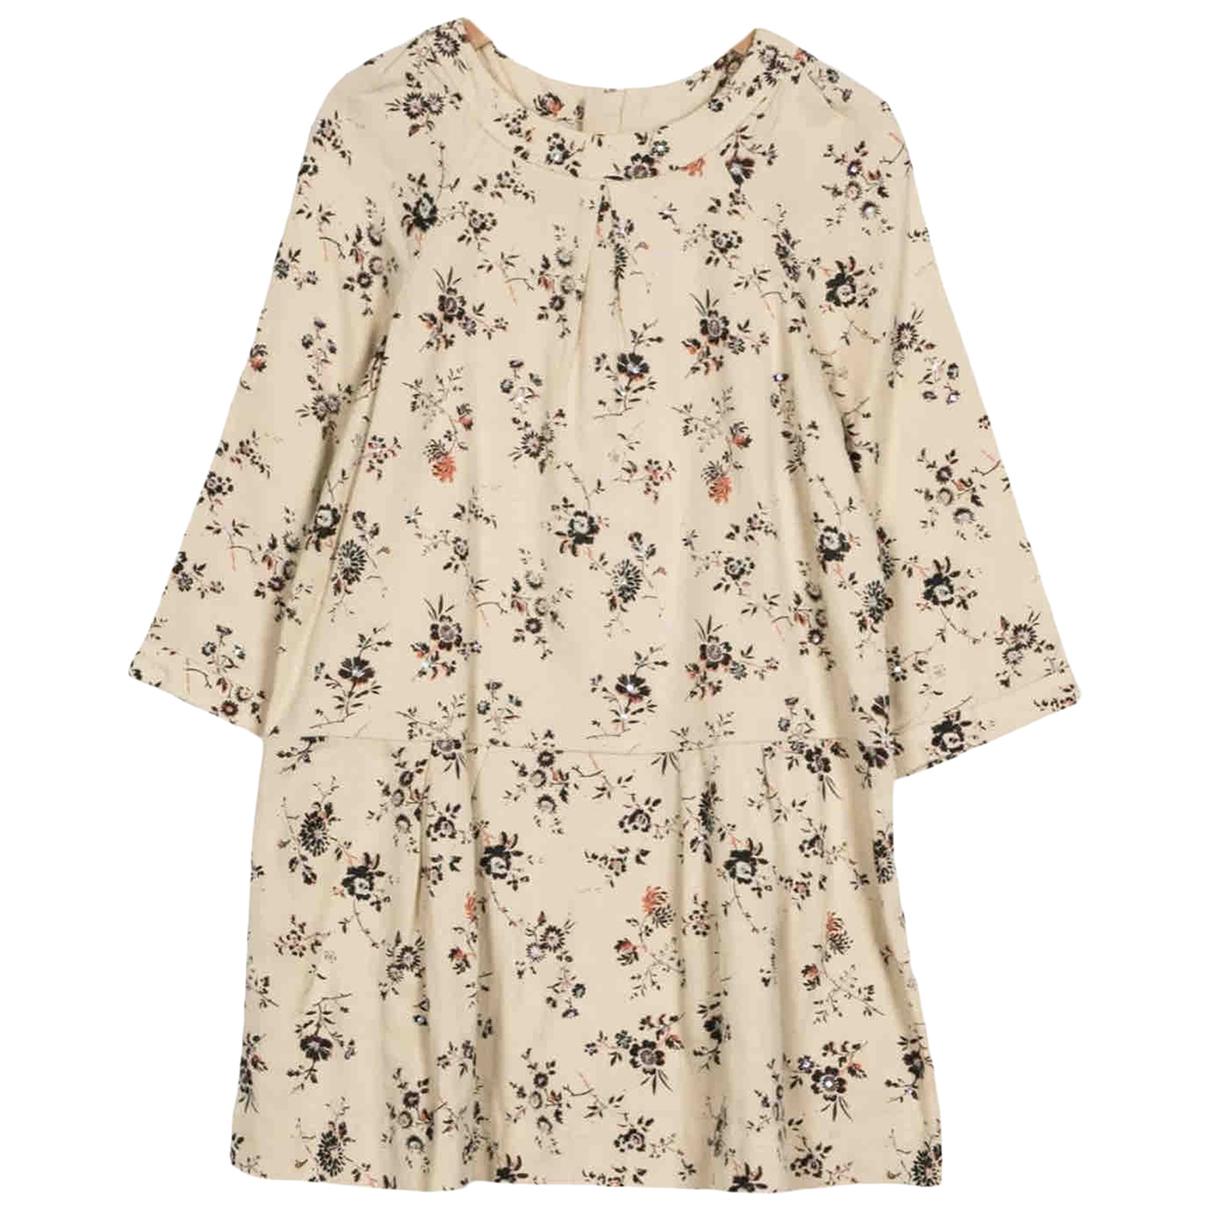 Bonpoint \N Kleid in  Ecru Wolle